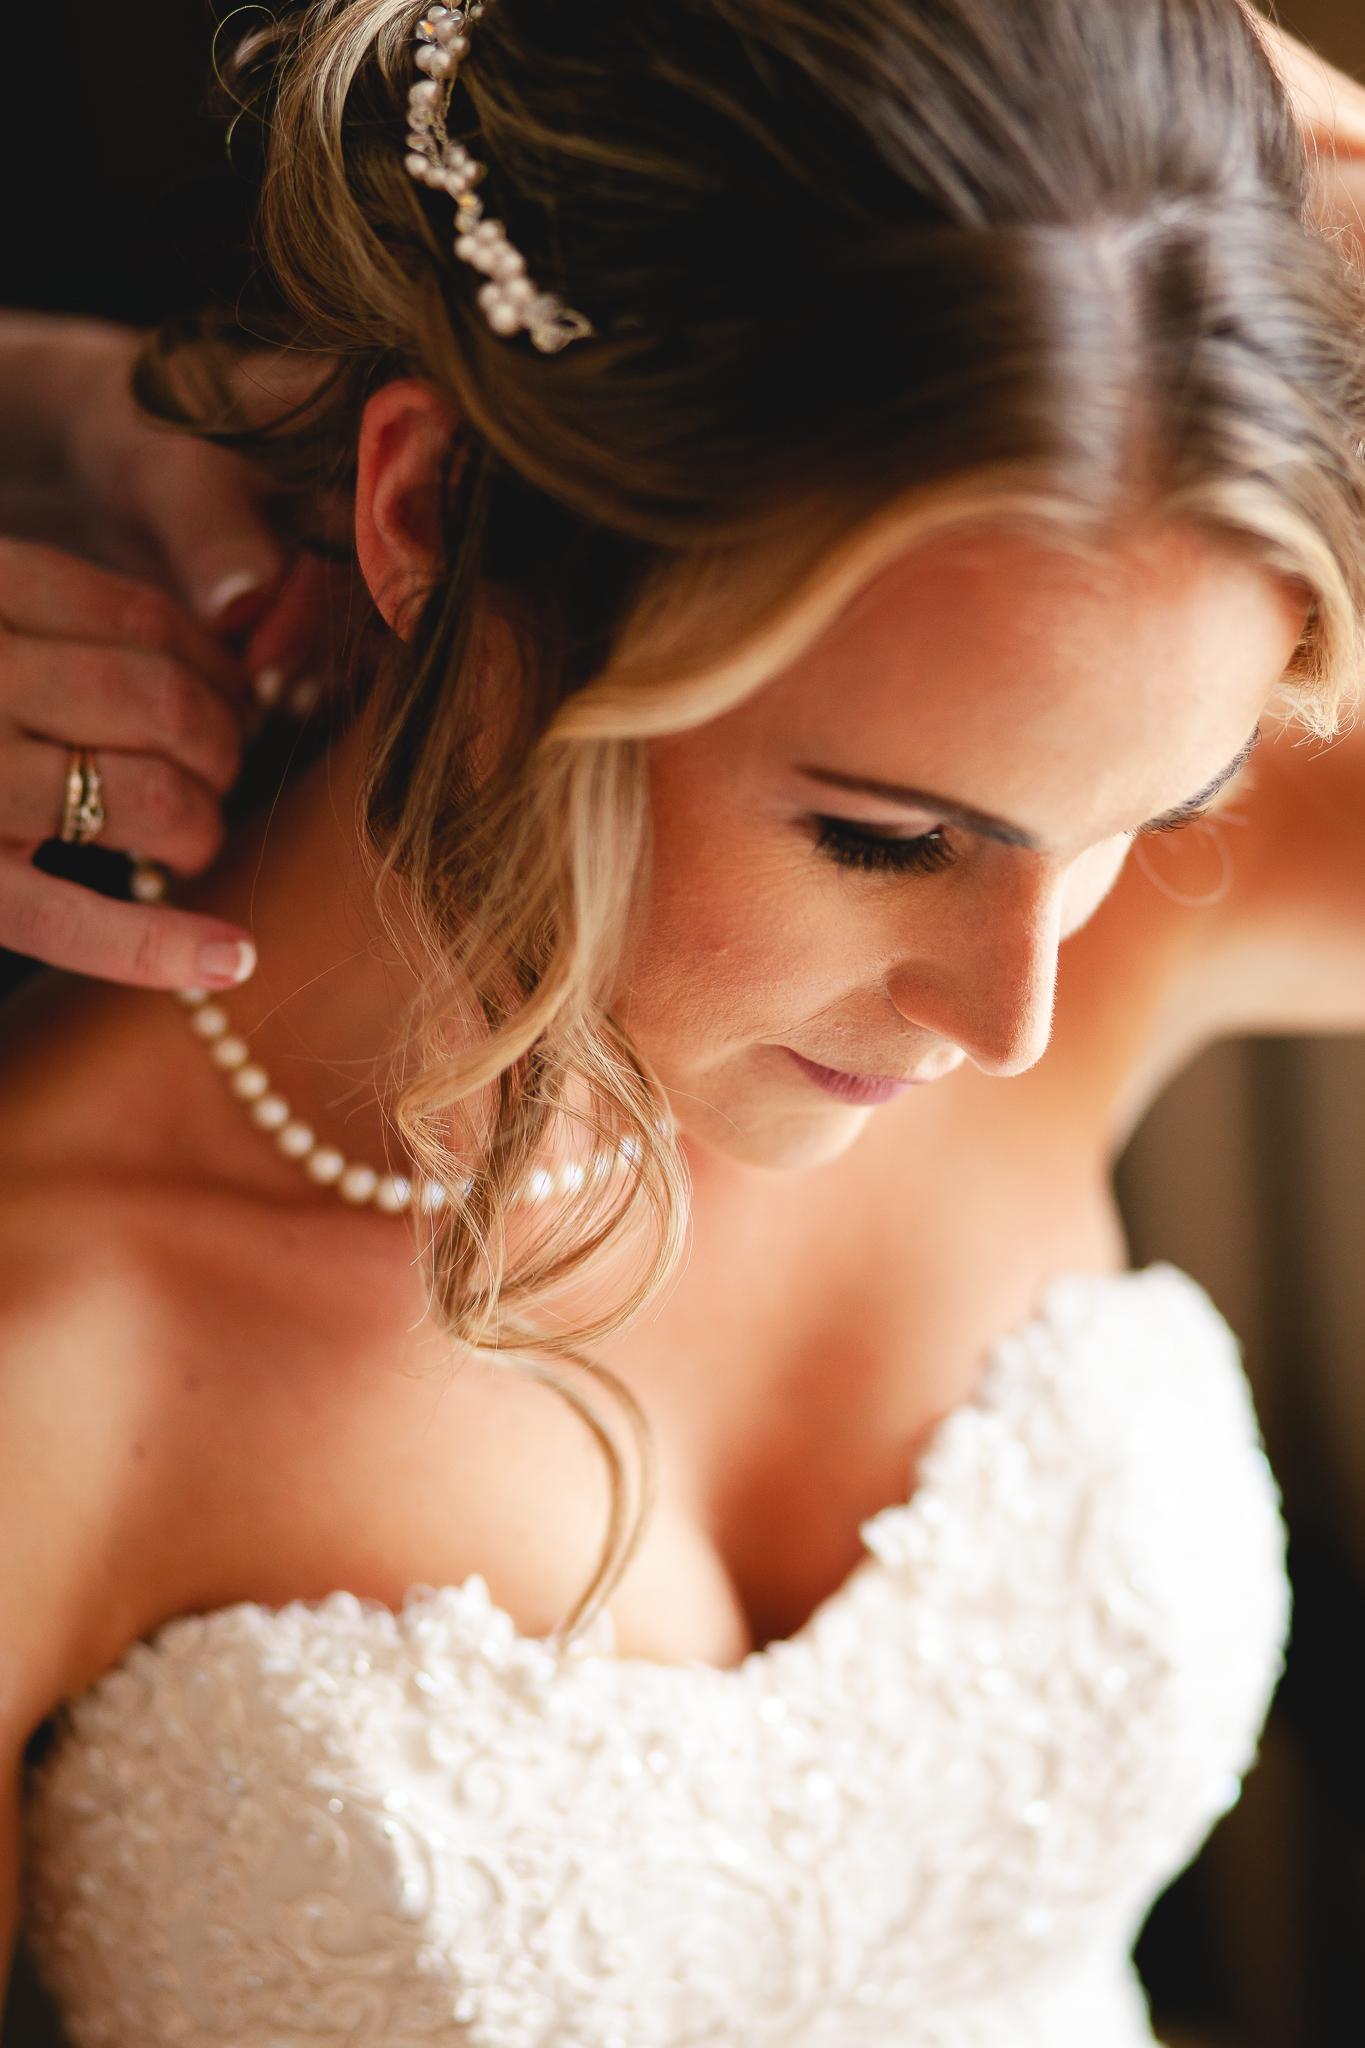 Amy D Photography- Barrie Wedding Photography- Wedding Getting Ready- Bride getting ready- Muskoka Wedding Photography-161.jpg